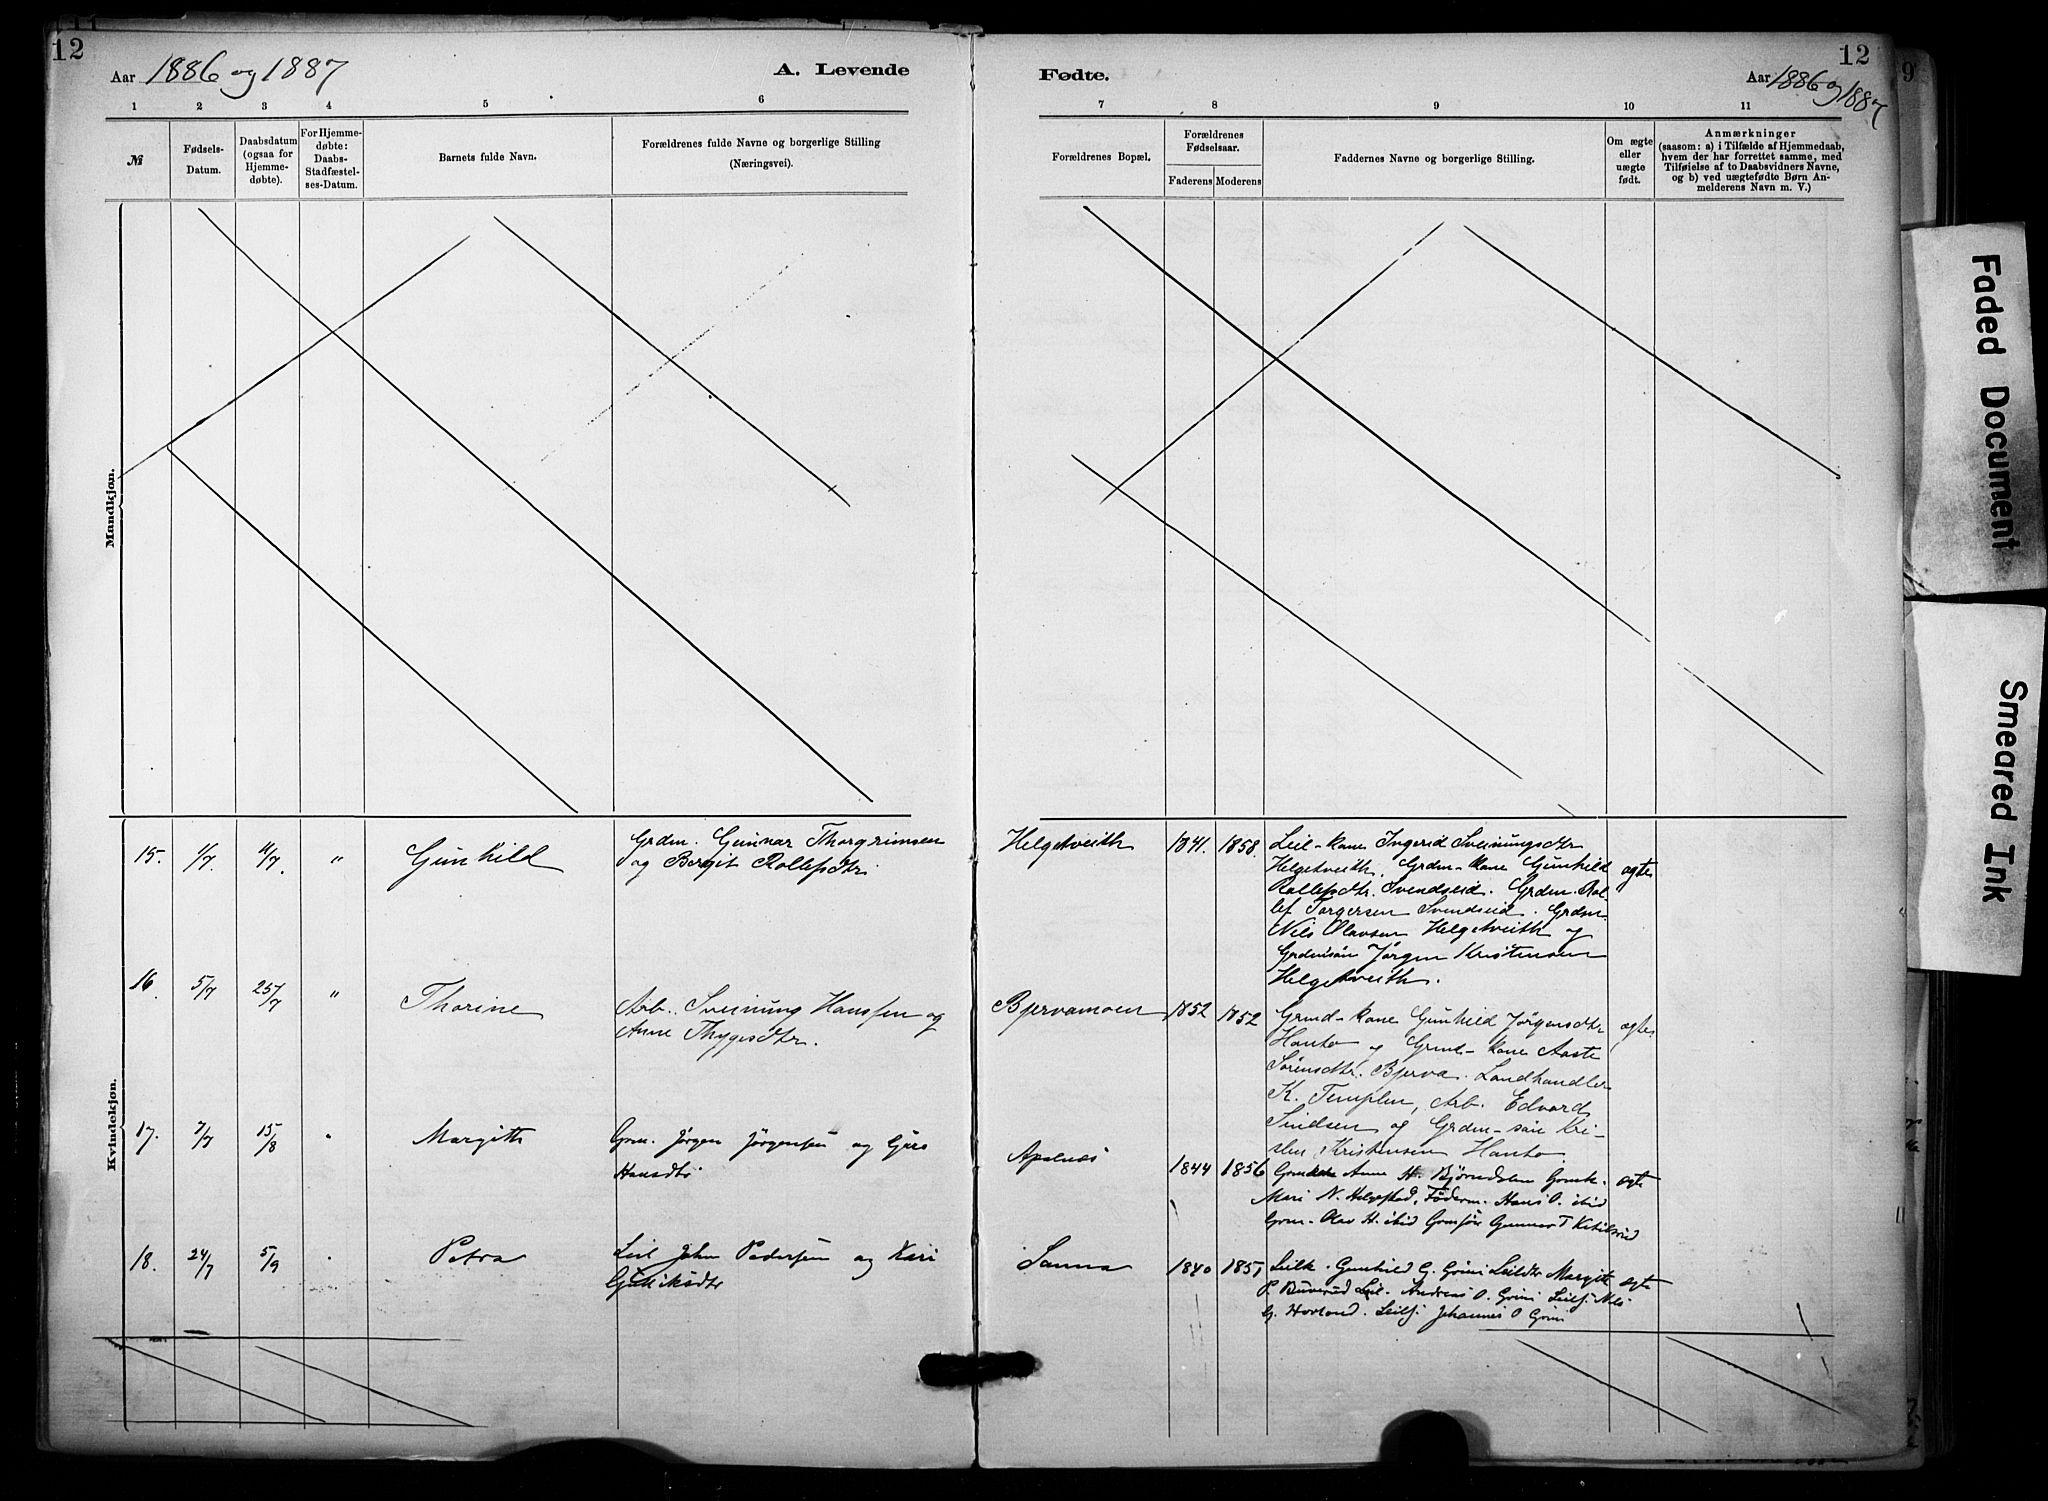 SAKO, Lunde kirkebøker, F/Fa/L0002: Ministerialbok nr. I 2, 1884-1892, s. 12